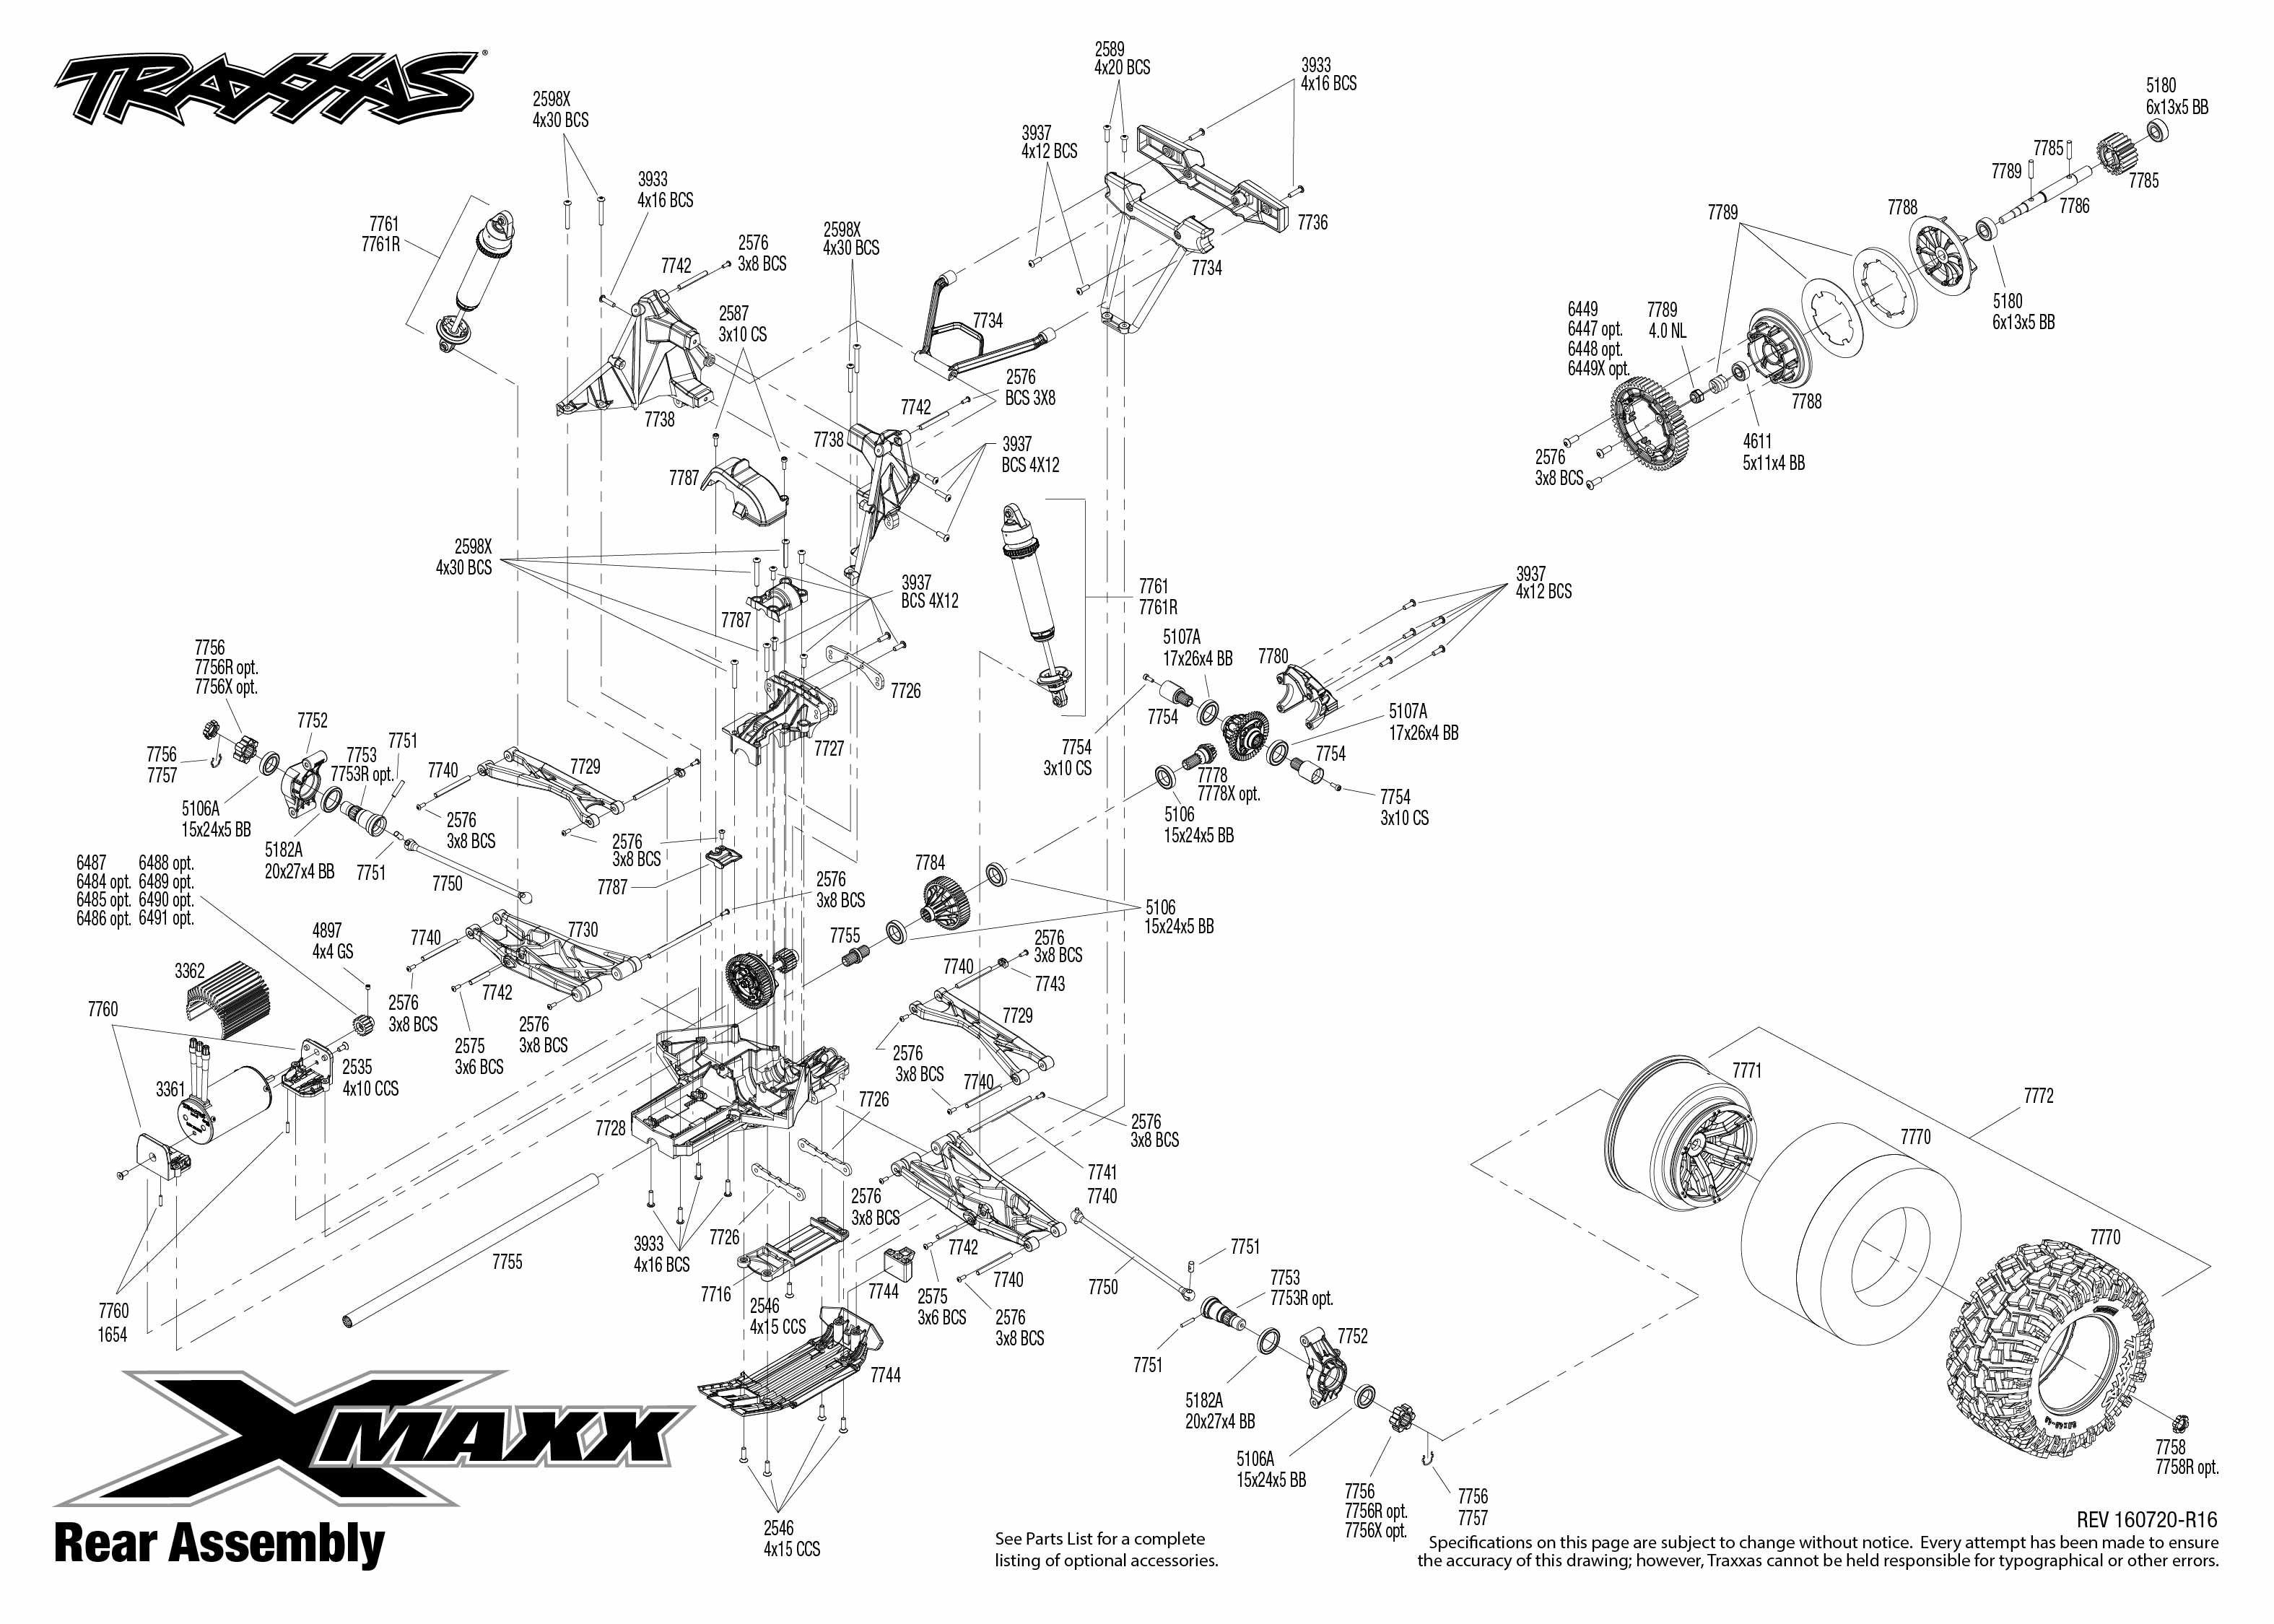 X Maxx 4 Rear Assembly Exploded View